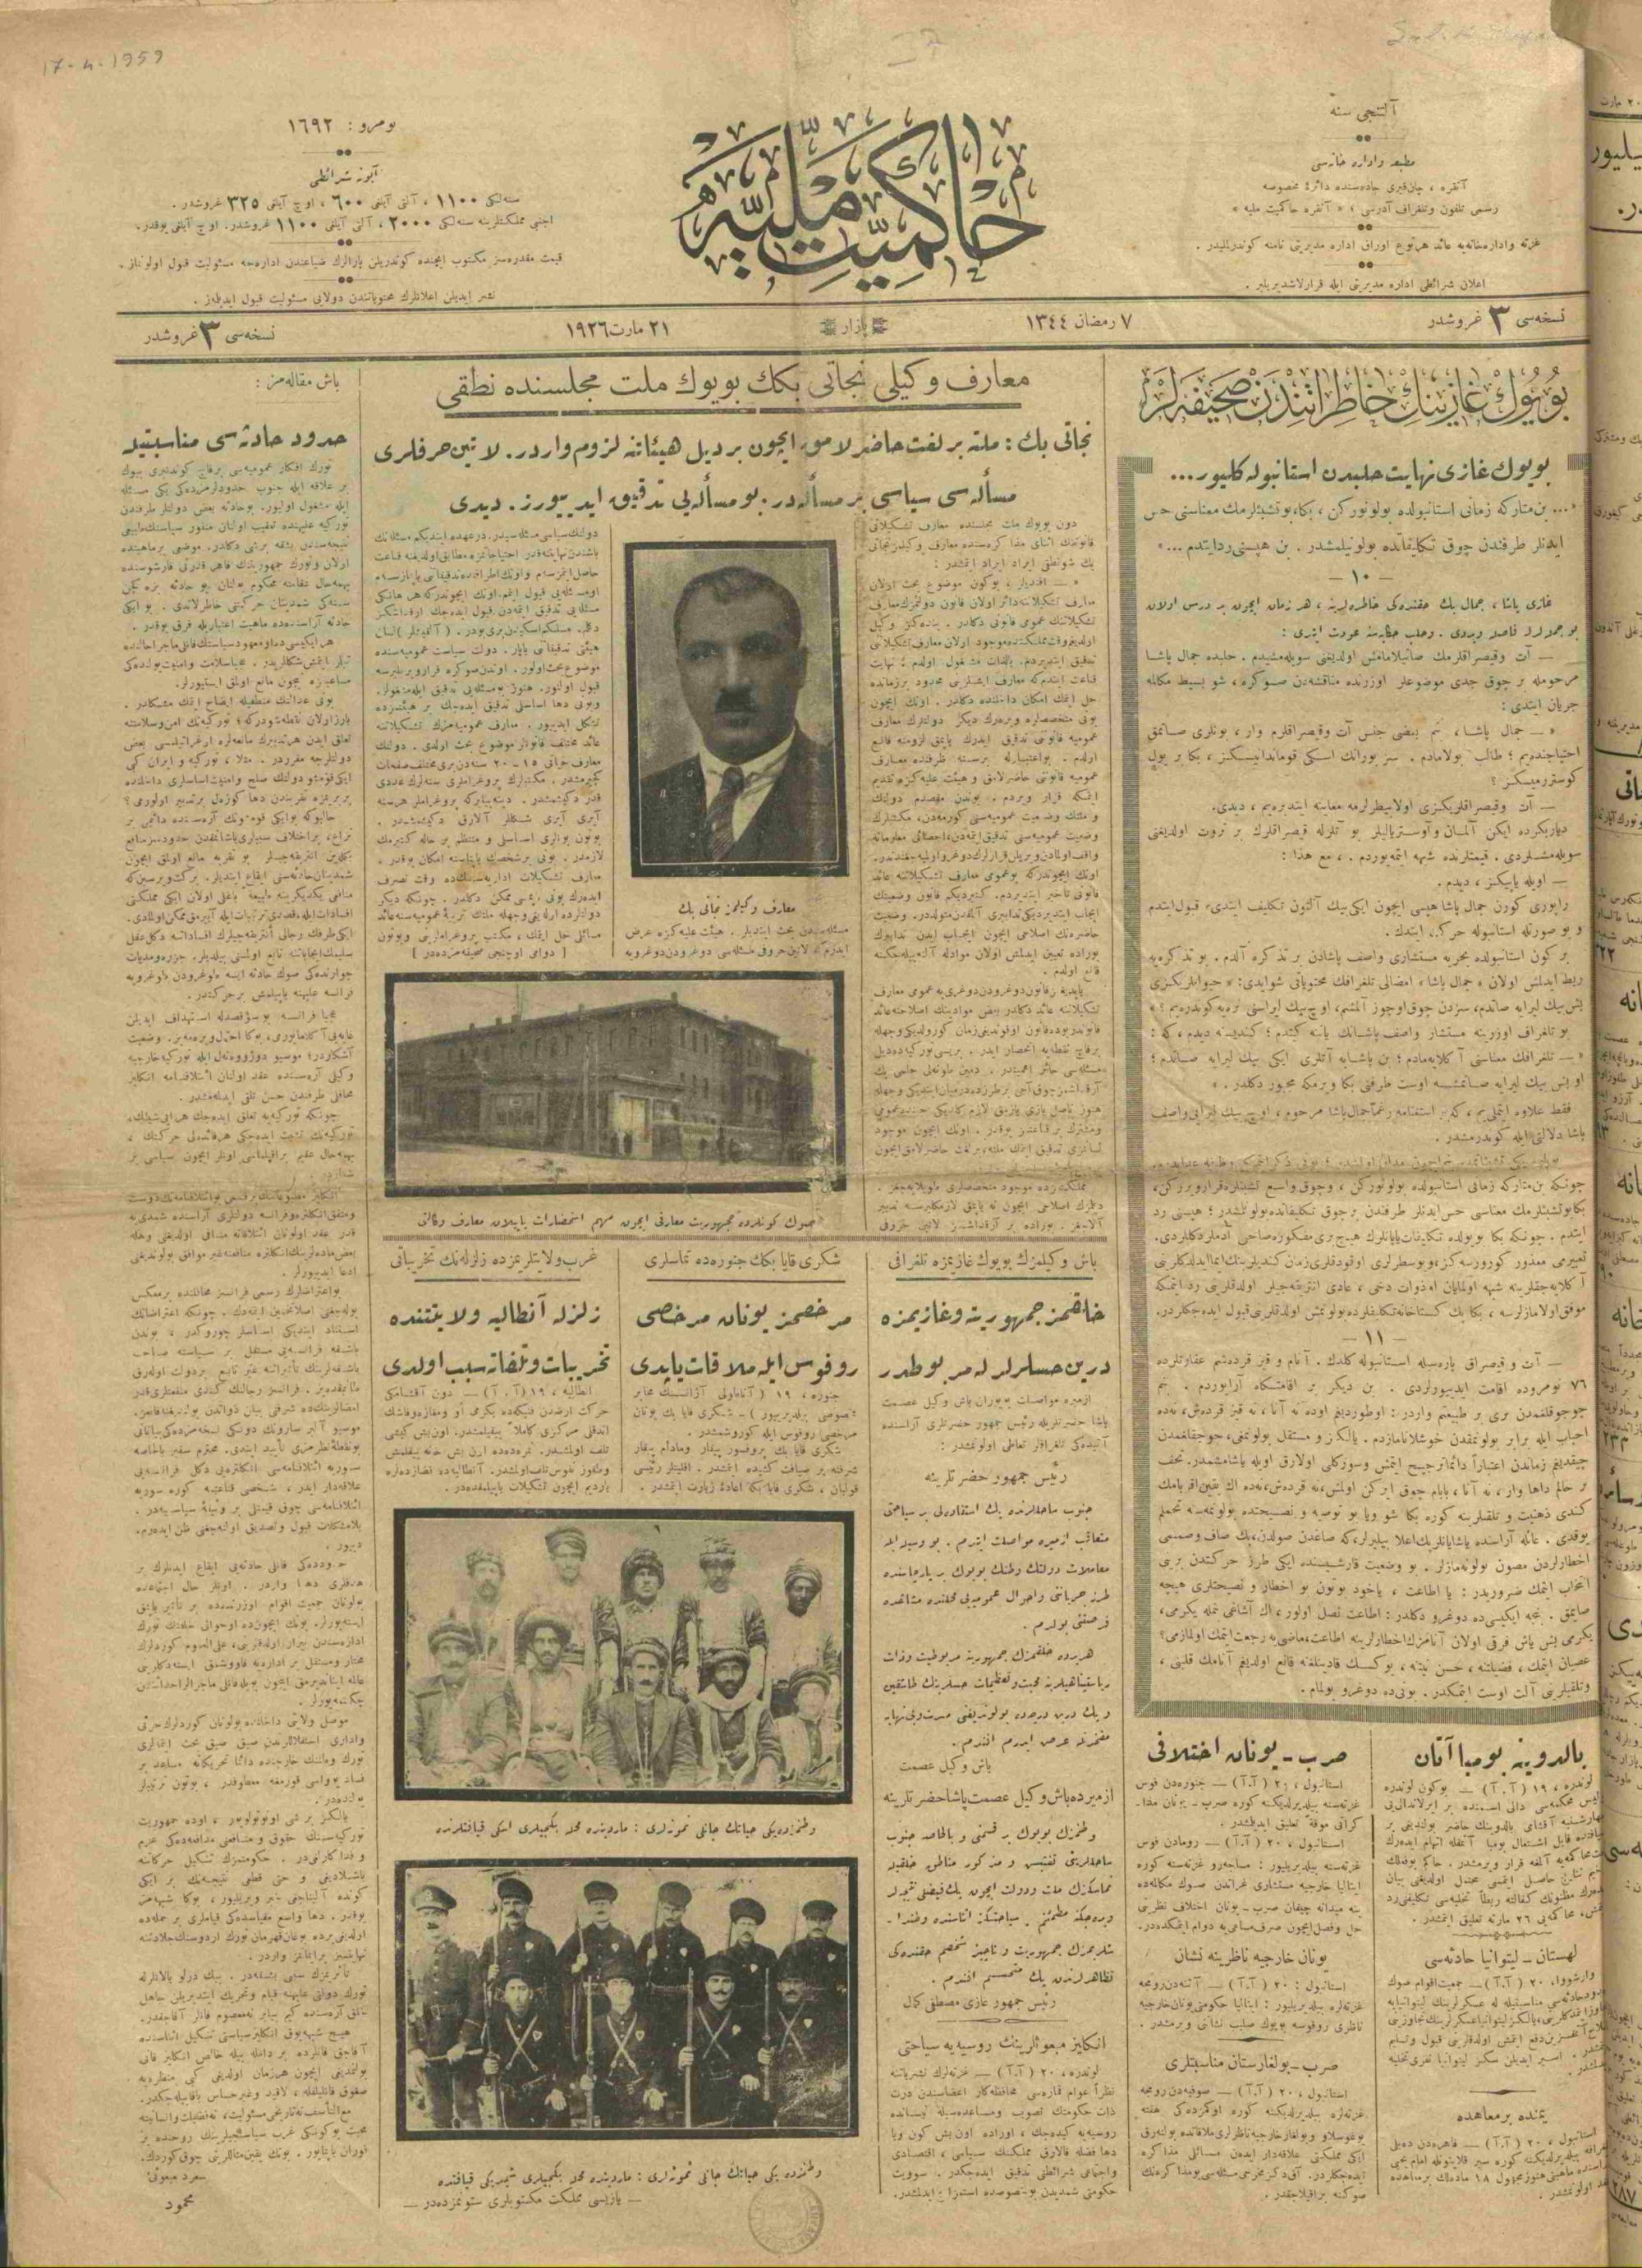 21 Mart 1926 Tarihli Hakimiyet-i Milliye Gazetesi Sayfa 1